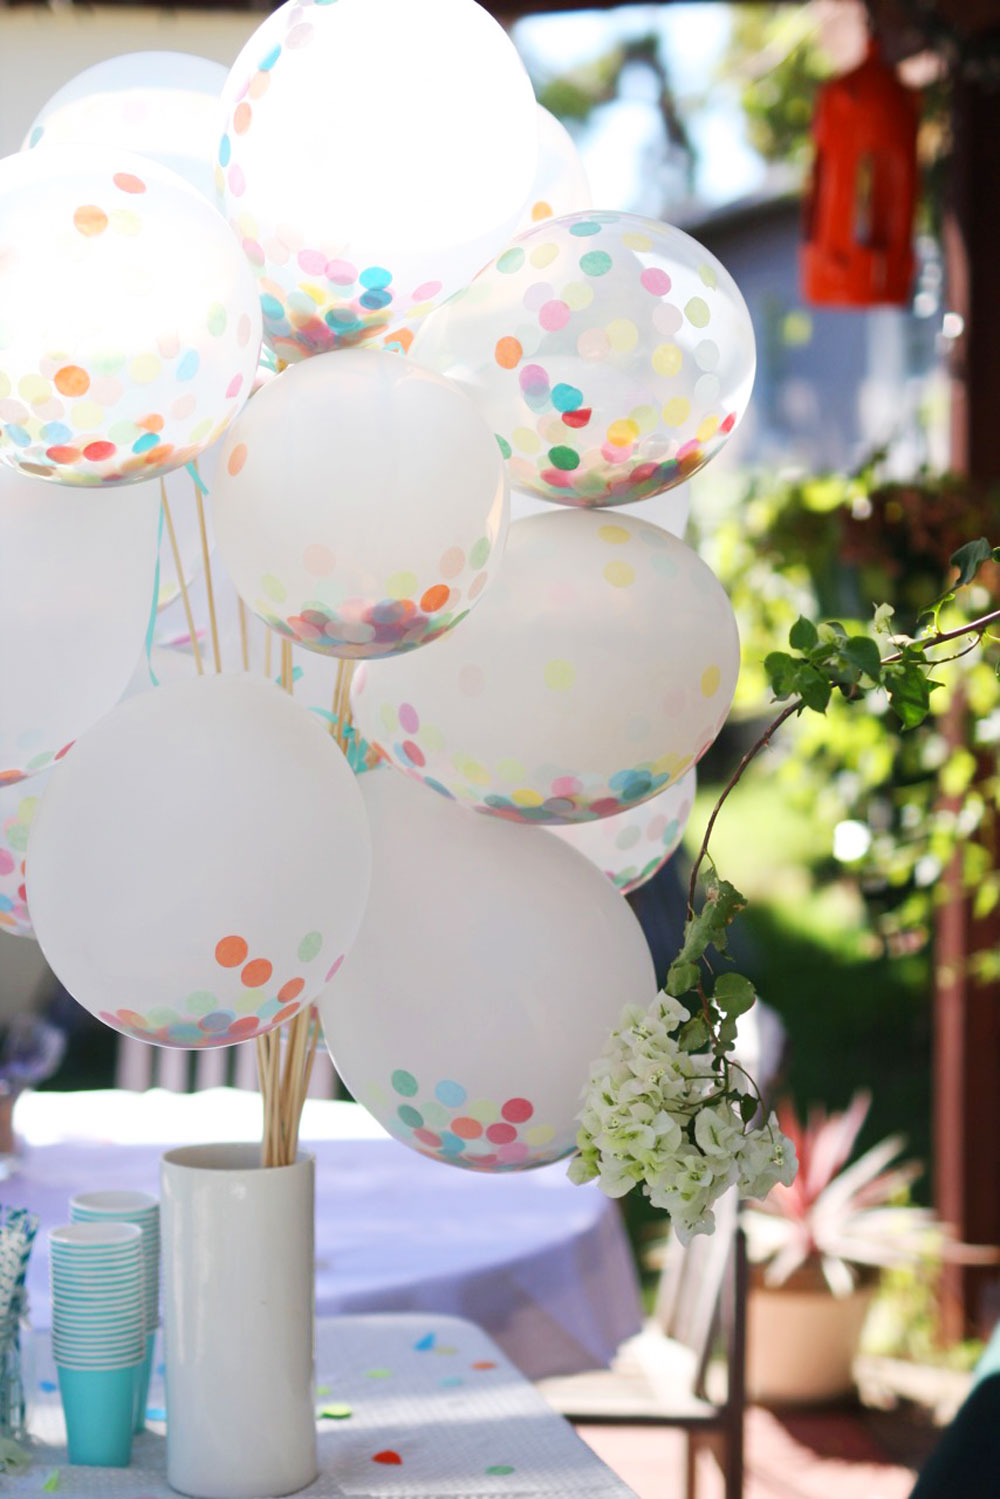 jestcafe.com-balloon-confetti1